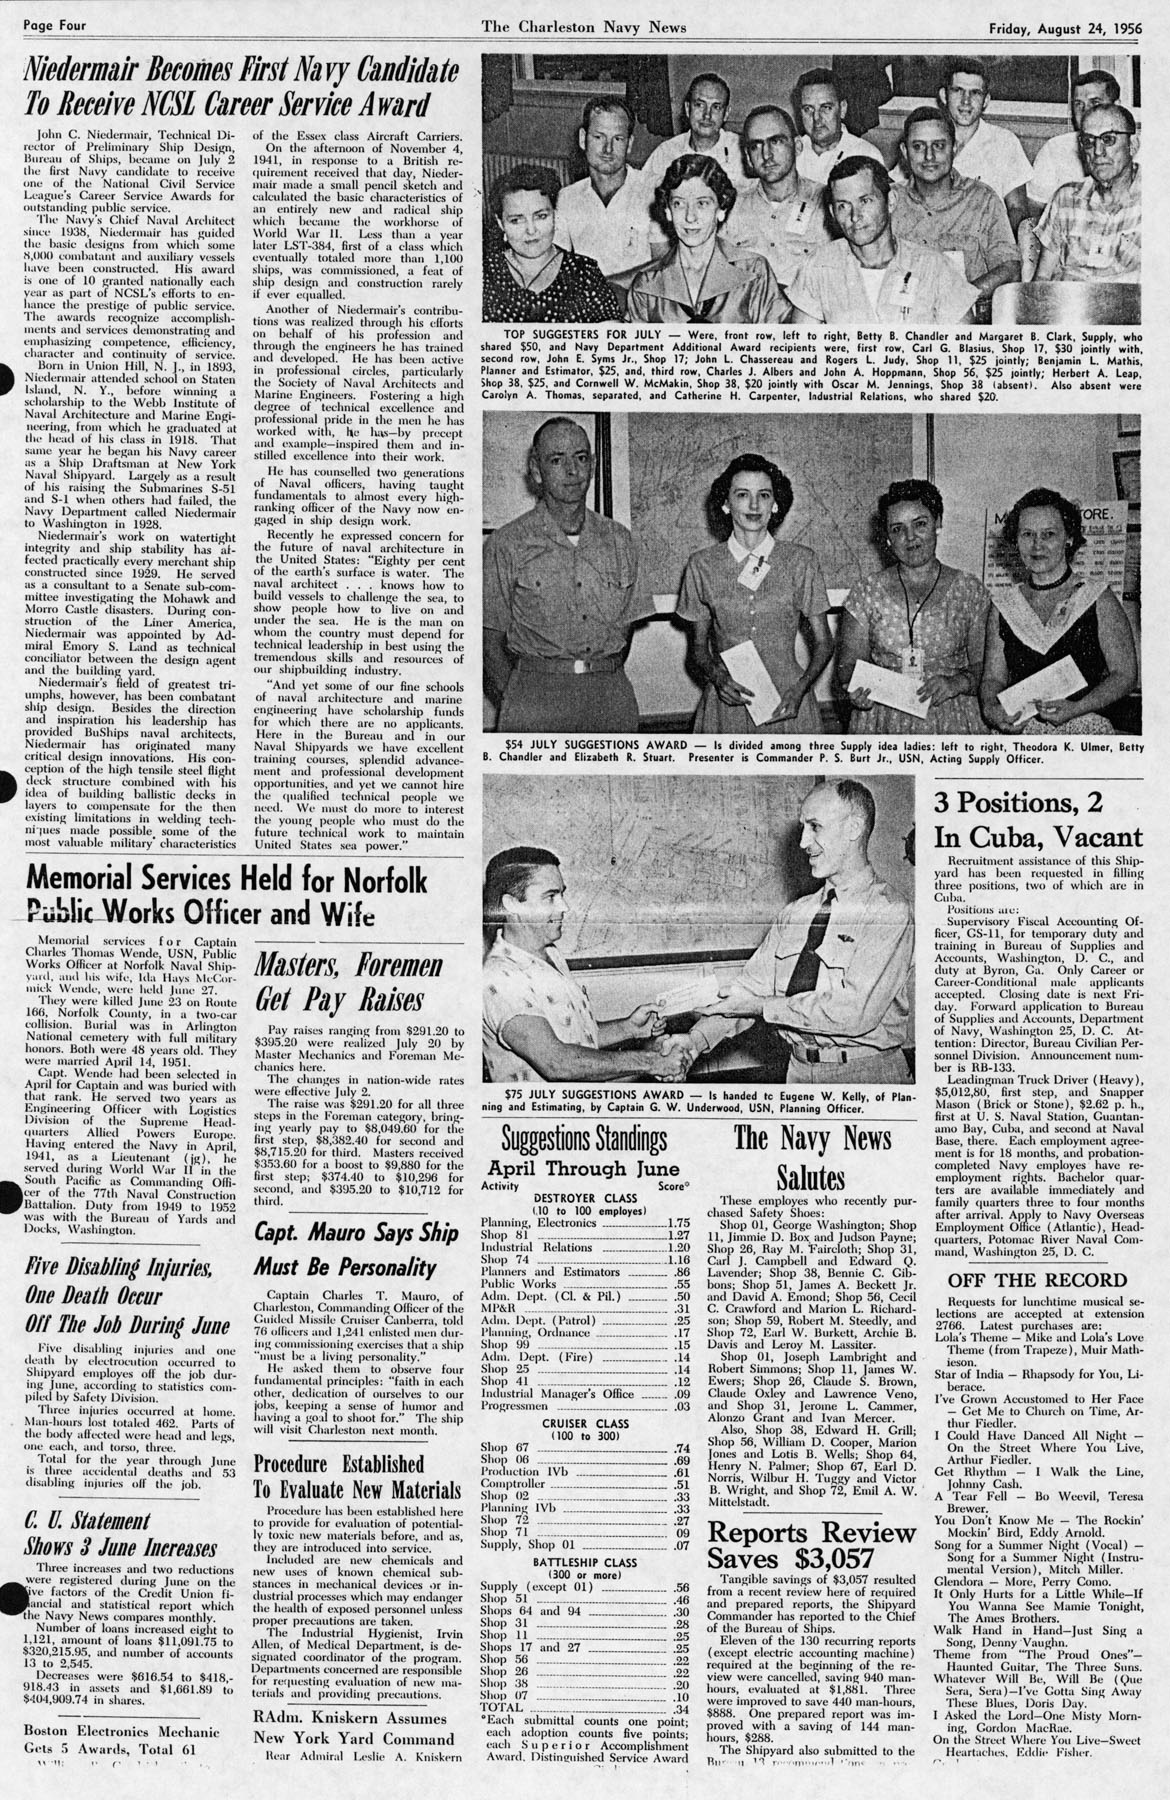 The Charleston Navy News, Volume 15, Edition 3, page iv